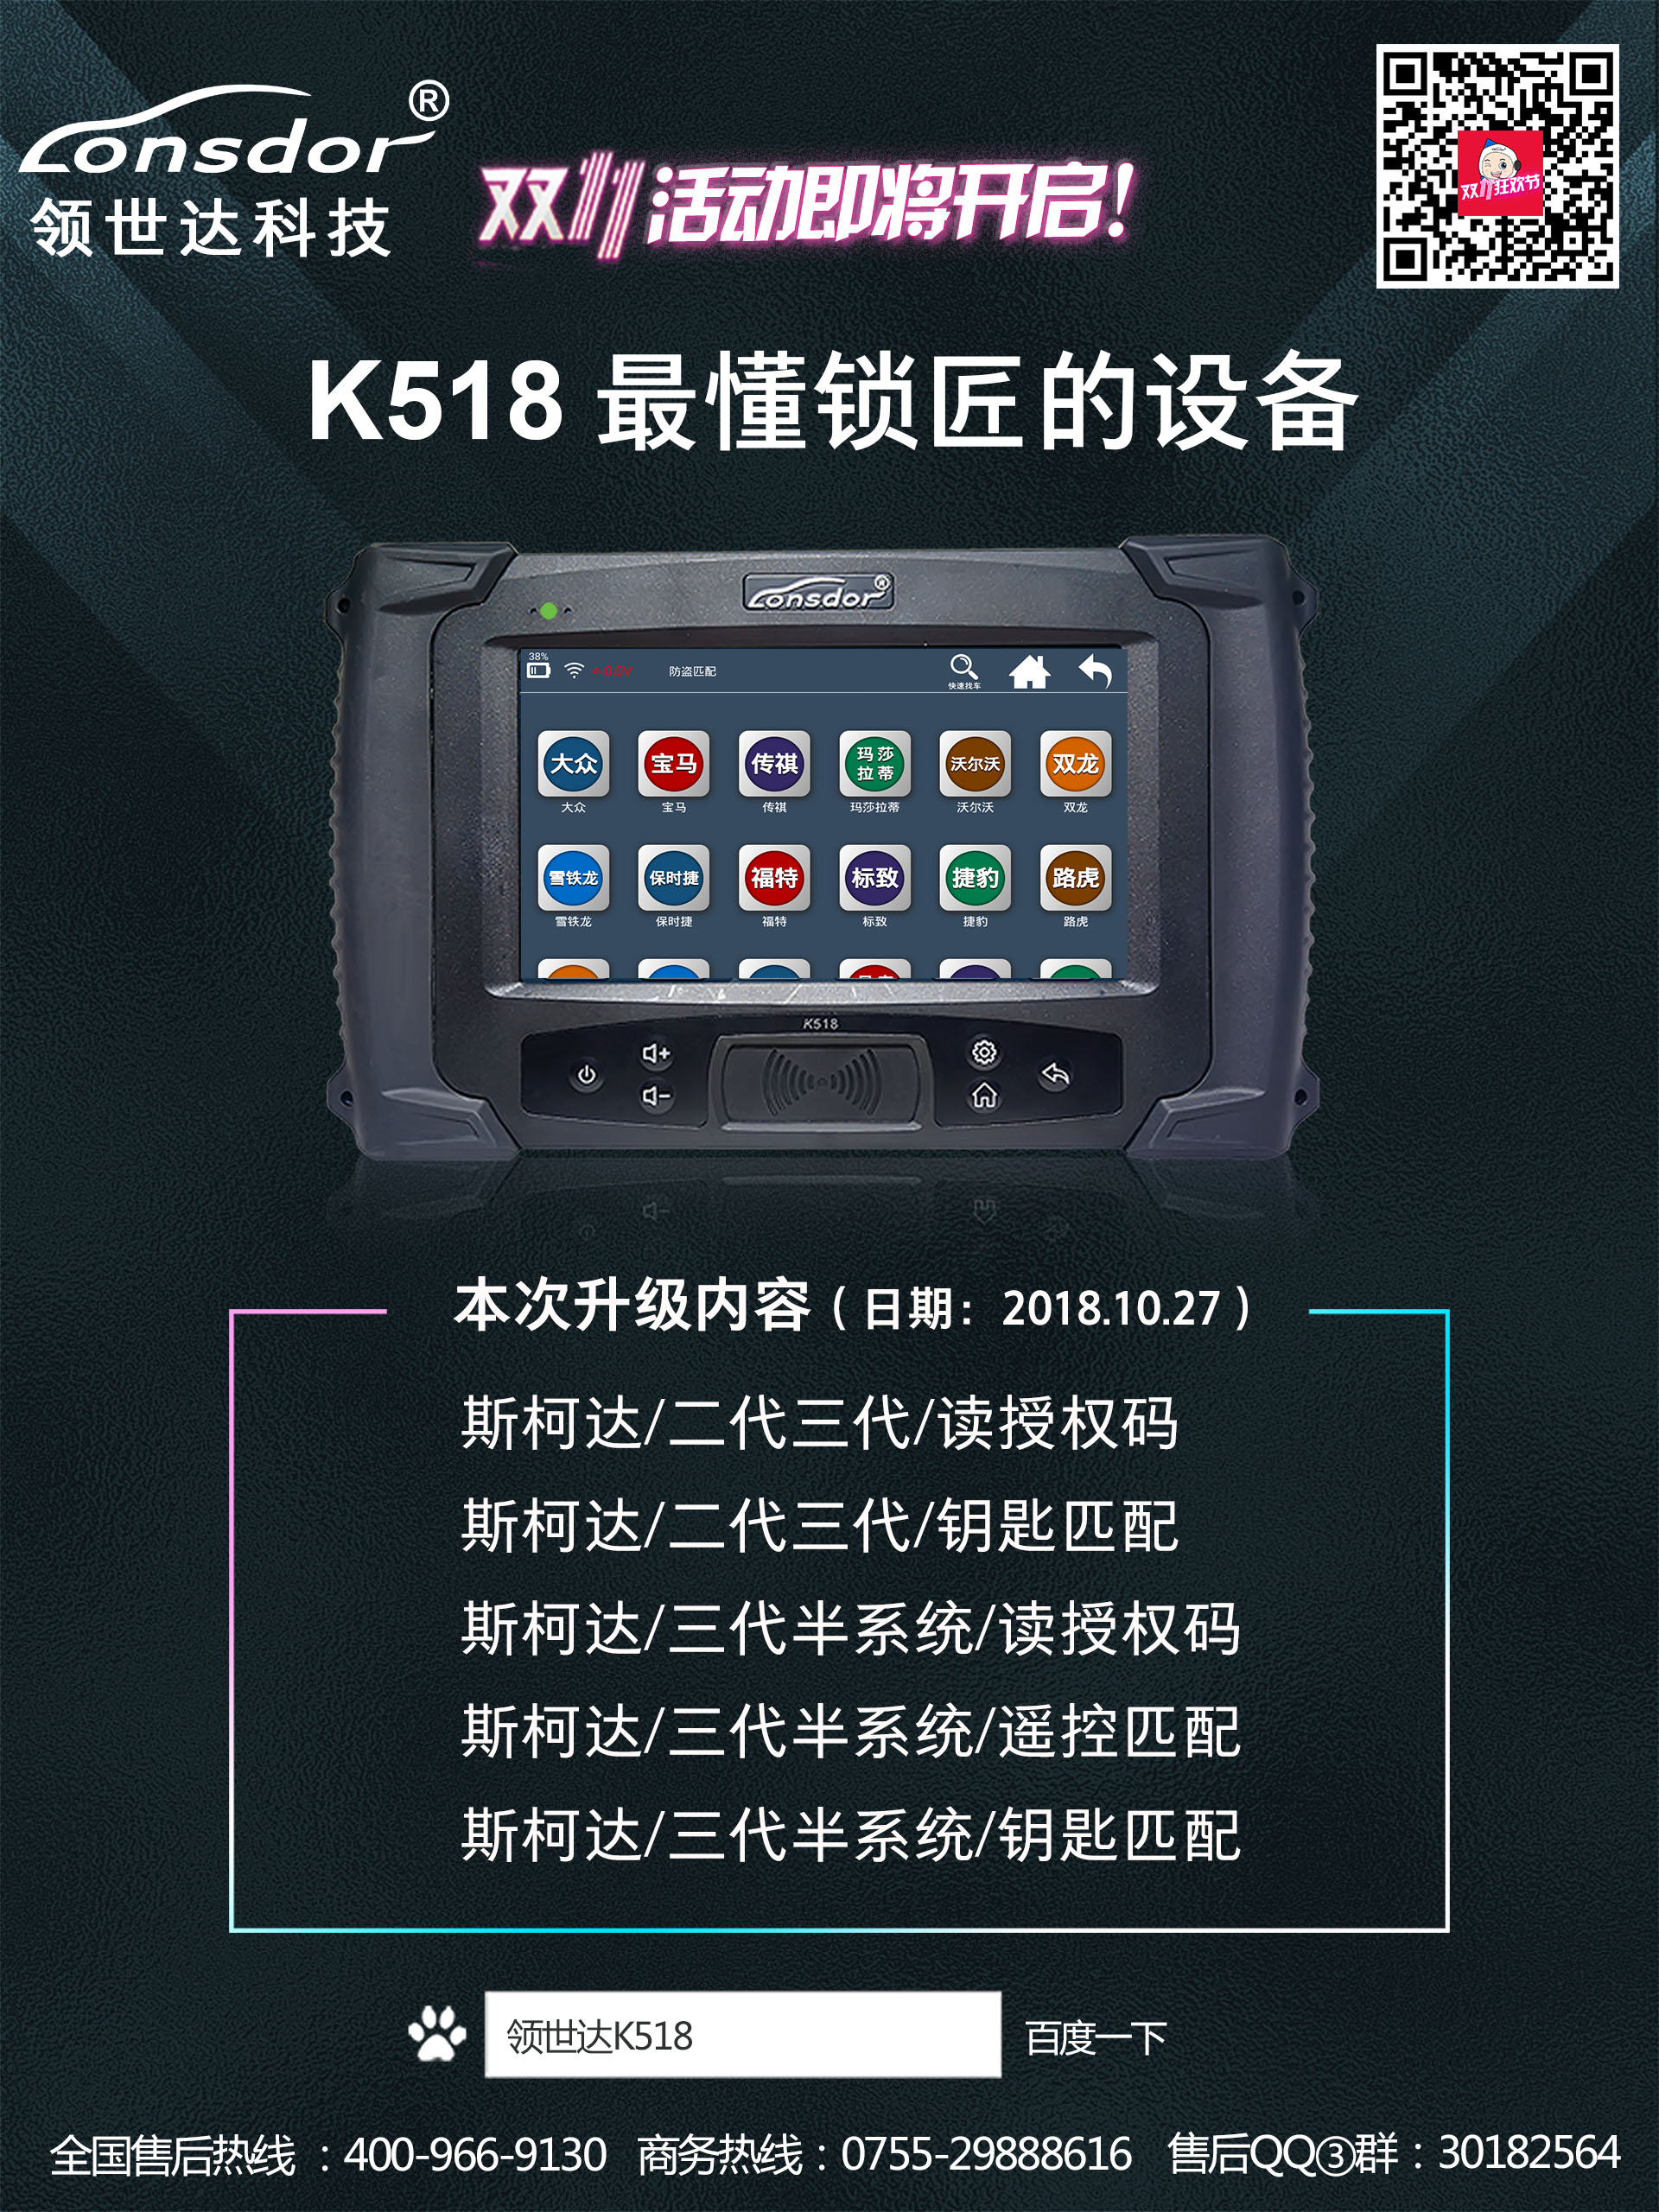 K518斯玛特升级(10-27)(1)